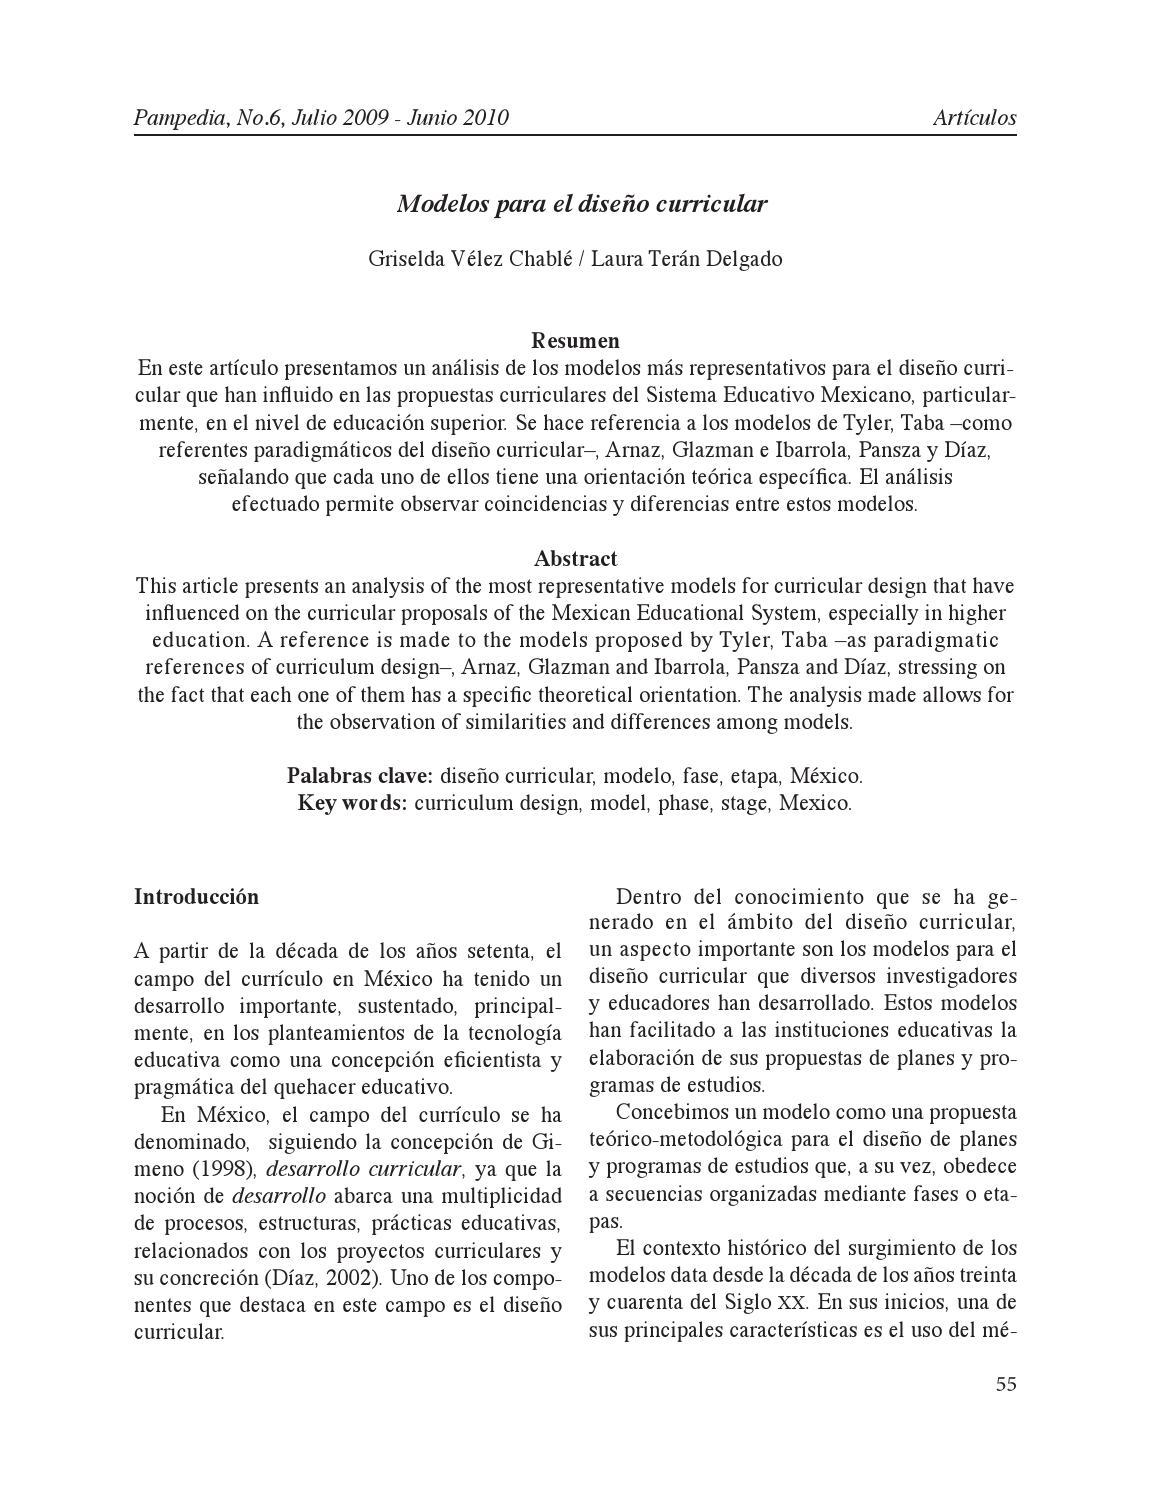 Modelos diseño curricular de velez y teran by Cristina de Silva - issuu